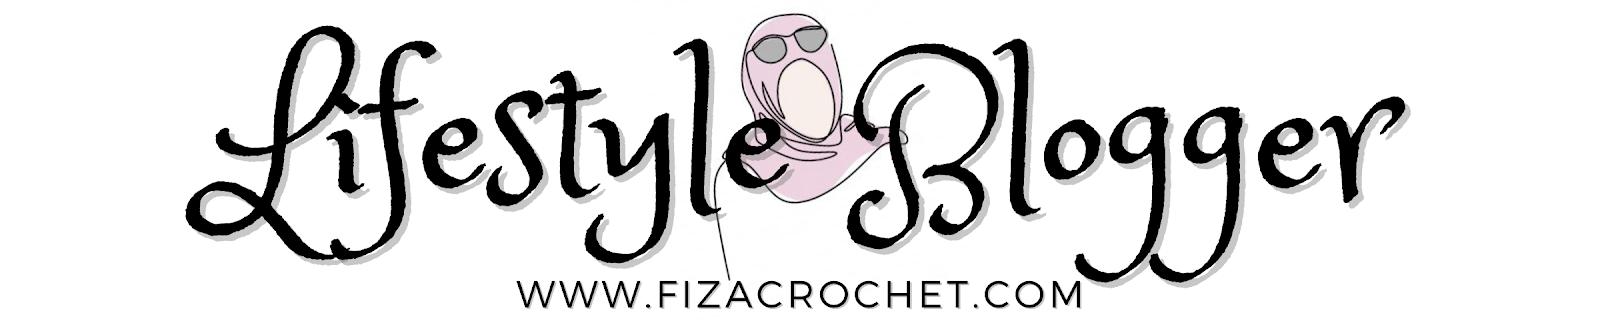 FizacrochetDotCom